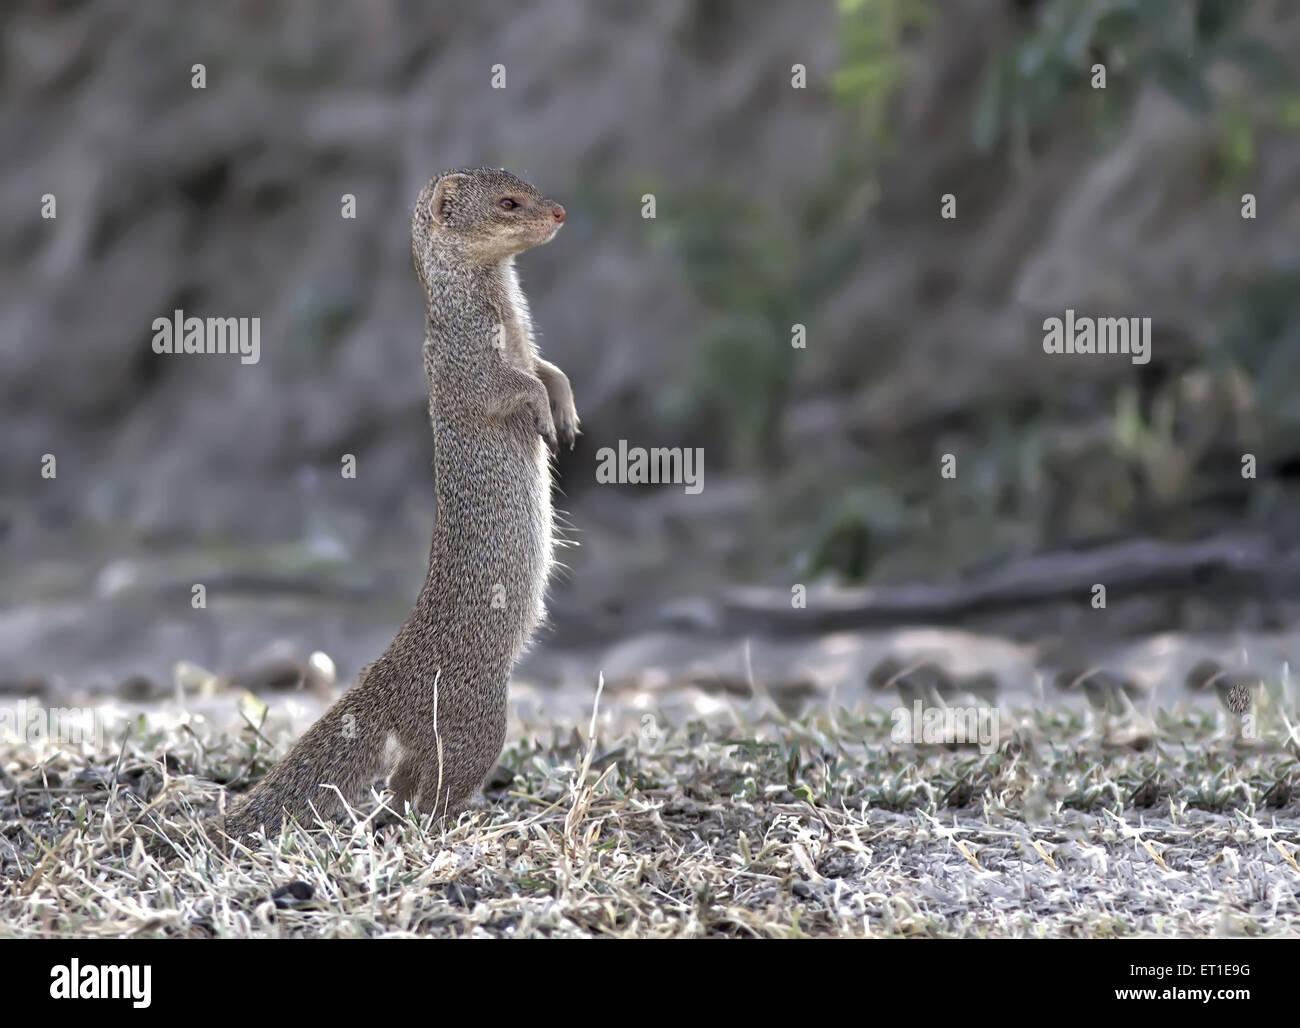 La mangusta in Rajasthan in India Immagini Stock